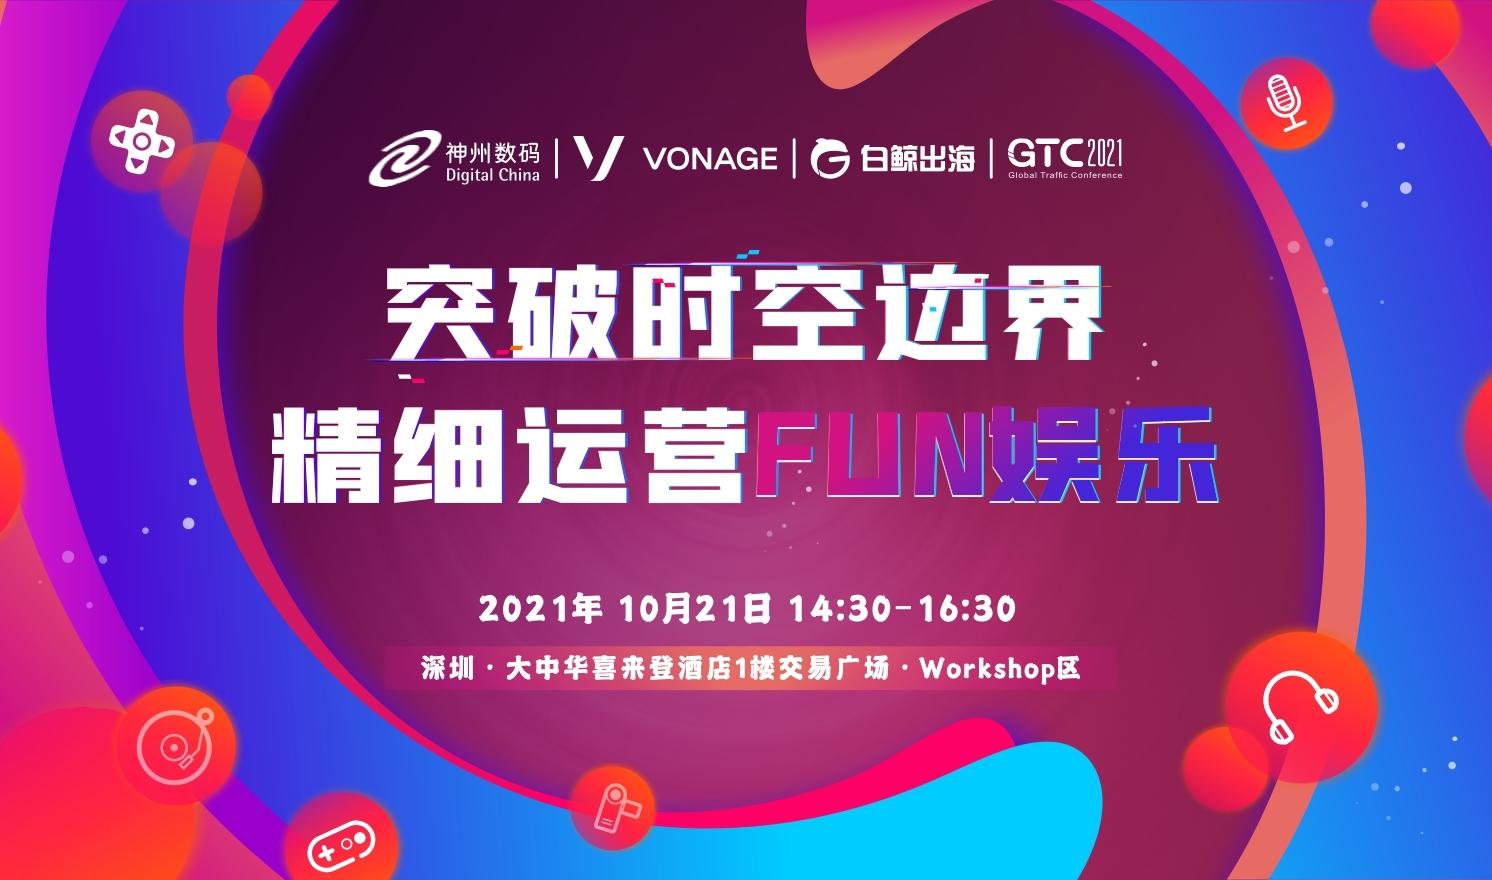 GTC2021-全球流量大会Workshop下午场-突破时间边界 精细运营FUN娱乐(2021-10-21)